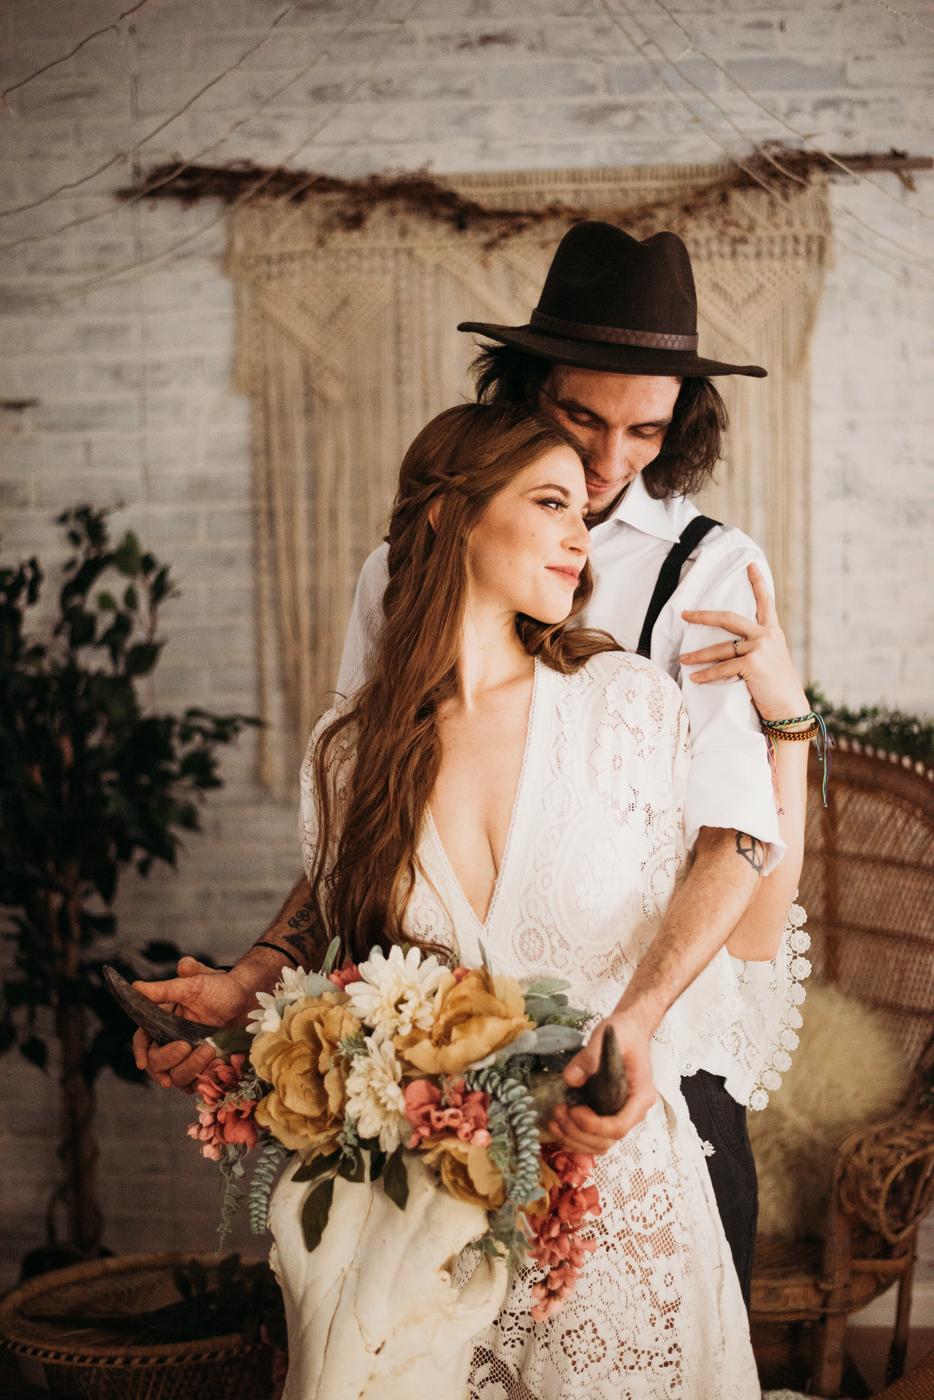 FortSt.John_photographer_TyraEPhotography_Wedding_Couple_Family_Photograhy_DawsonCreek_Elopement_Bride_Boduoir_Portraits-4767.jpg